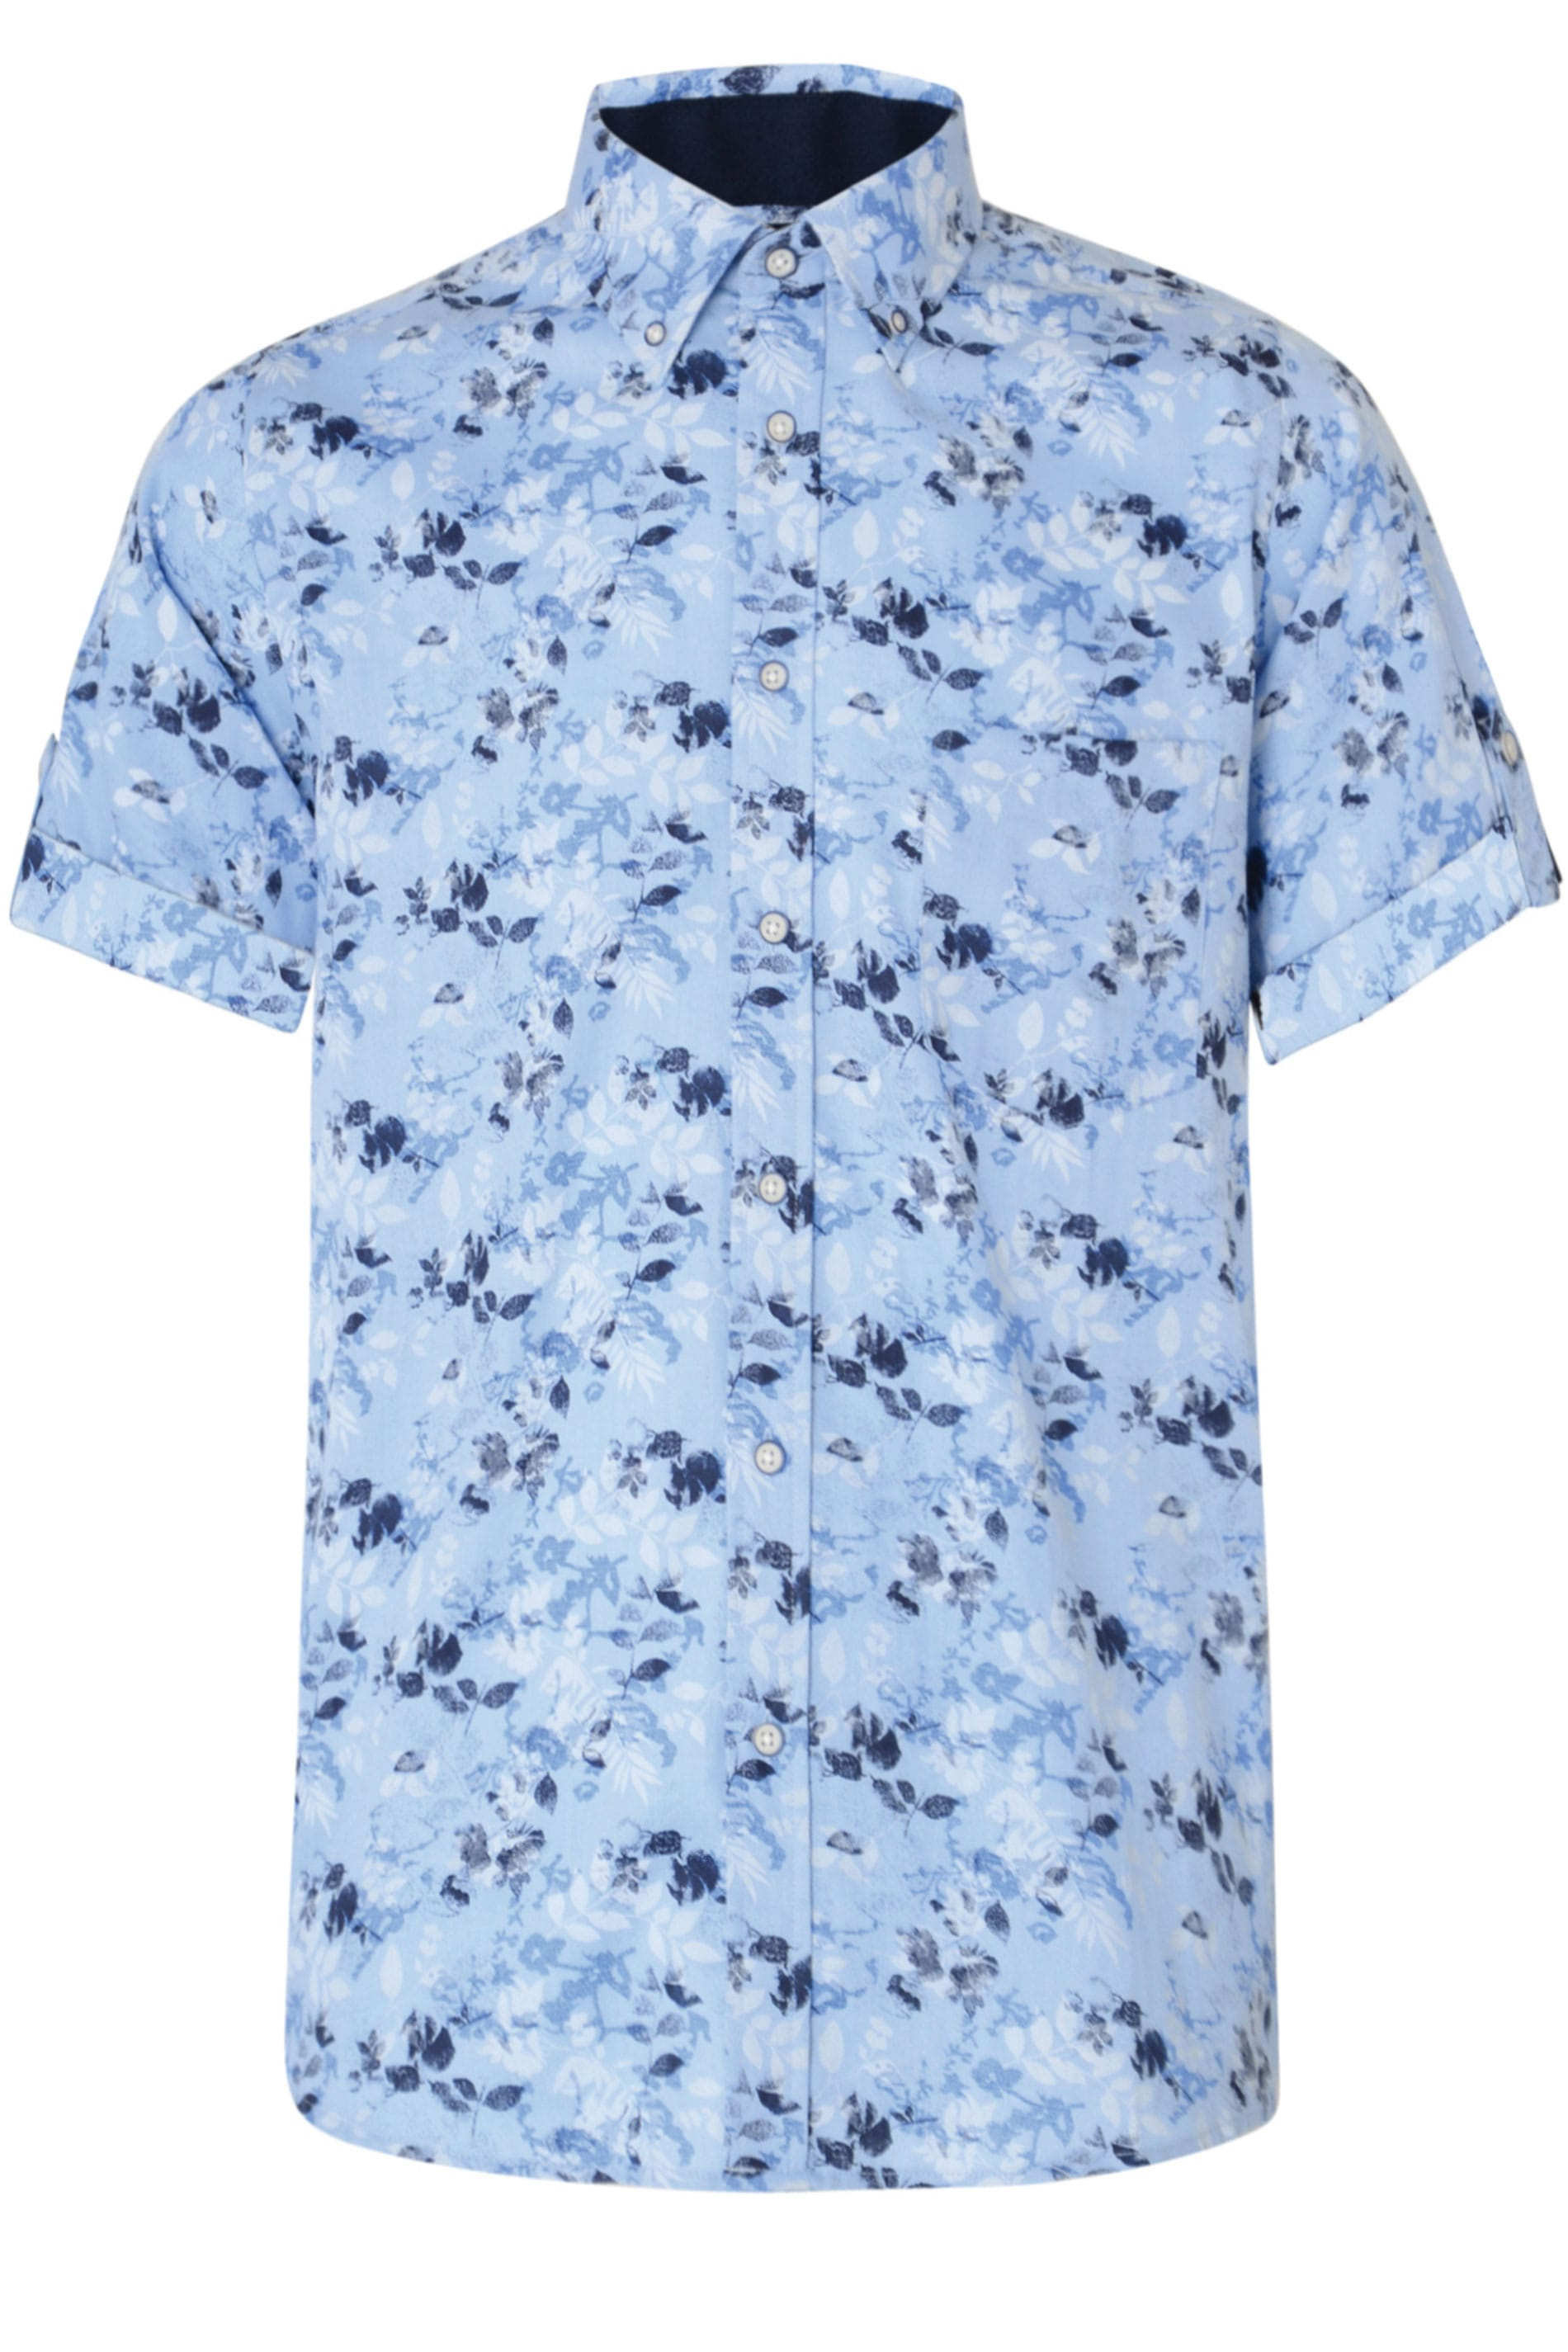 KAM Blue & Navy Floral Print Shirt